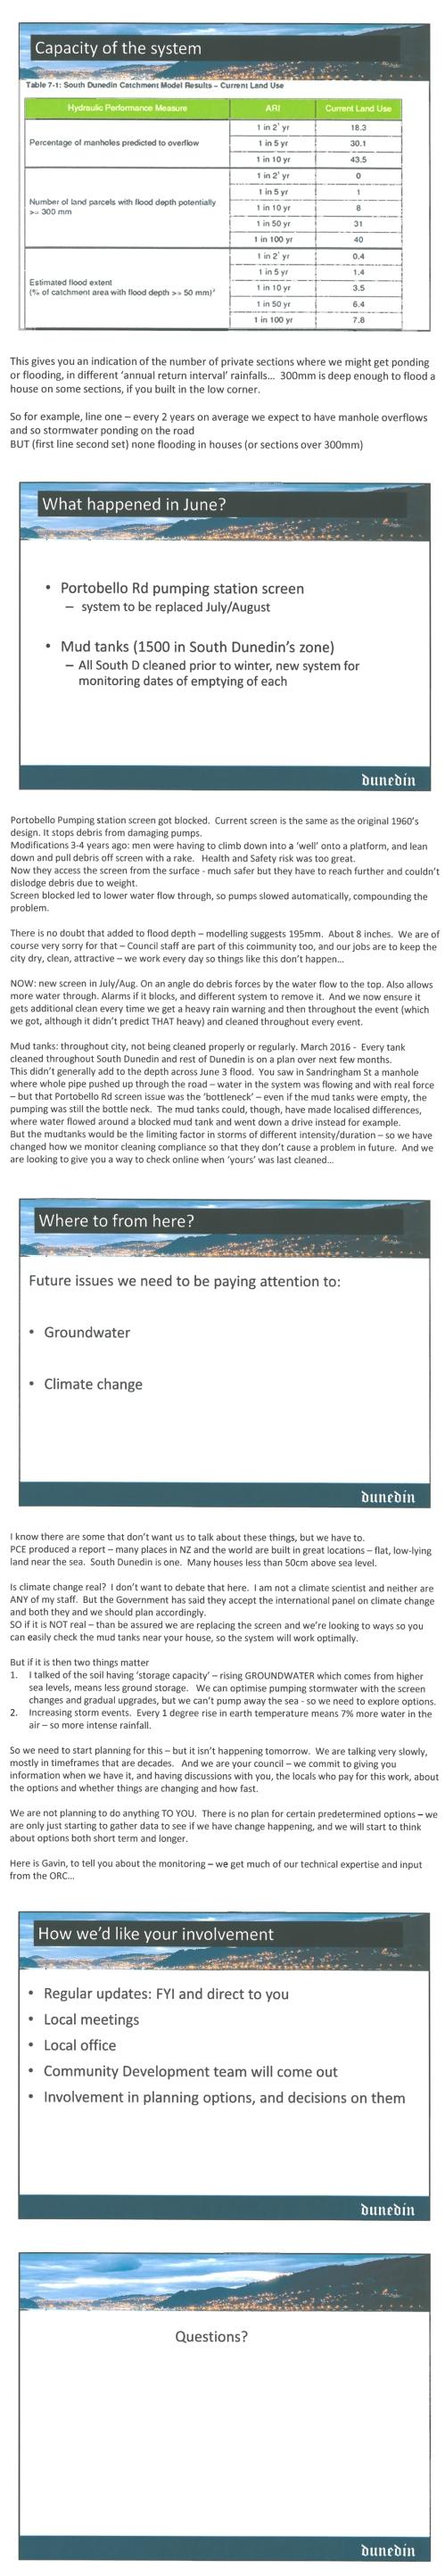 Sue Bidrose South Dunedin and stormwater June 20 2016 pp6-10